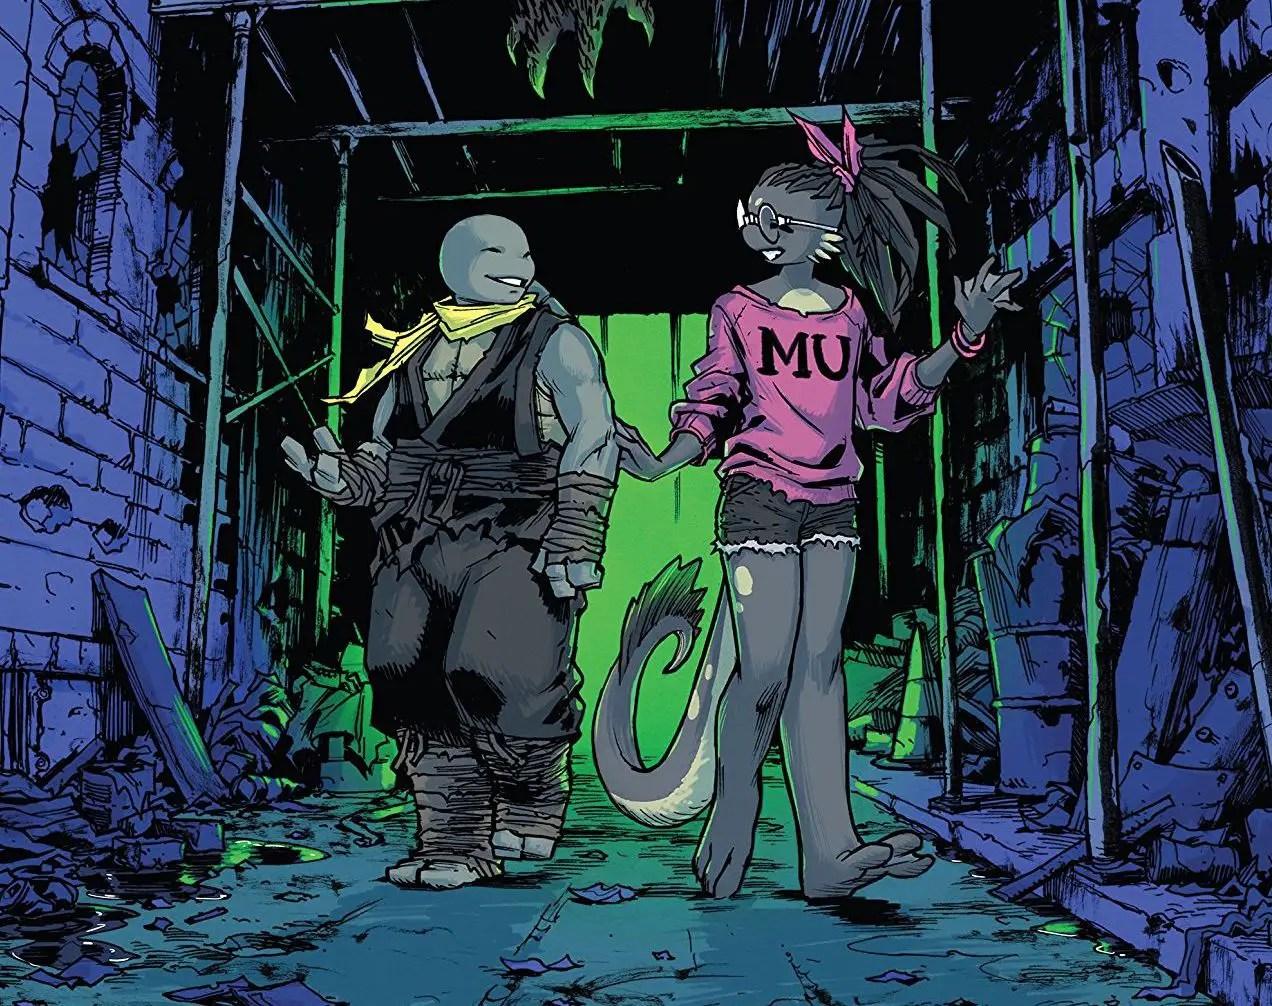 Teenage Mutant Ninja Turtles #102 Review